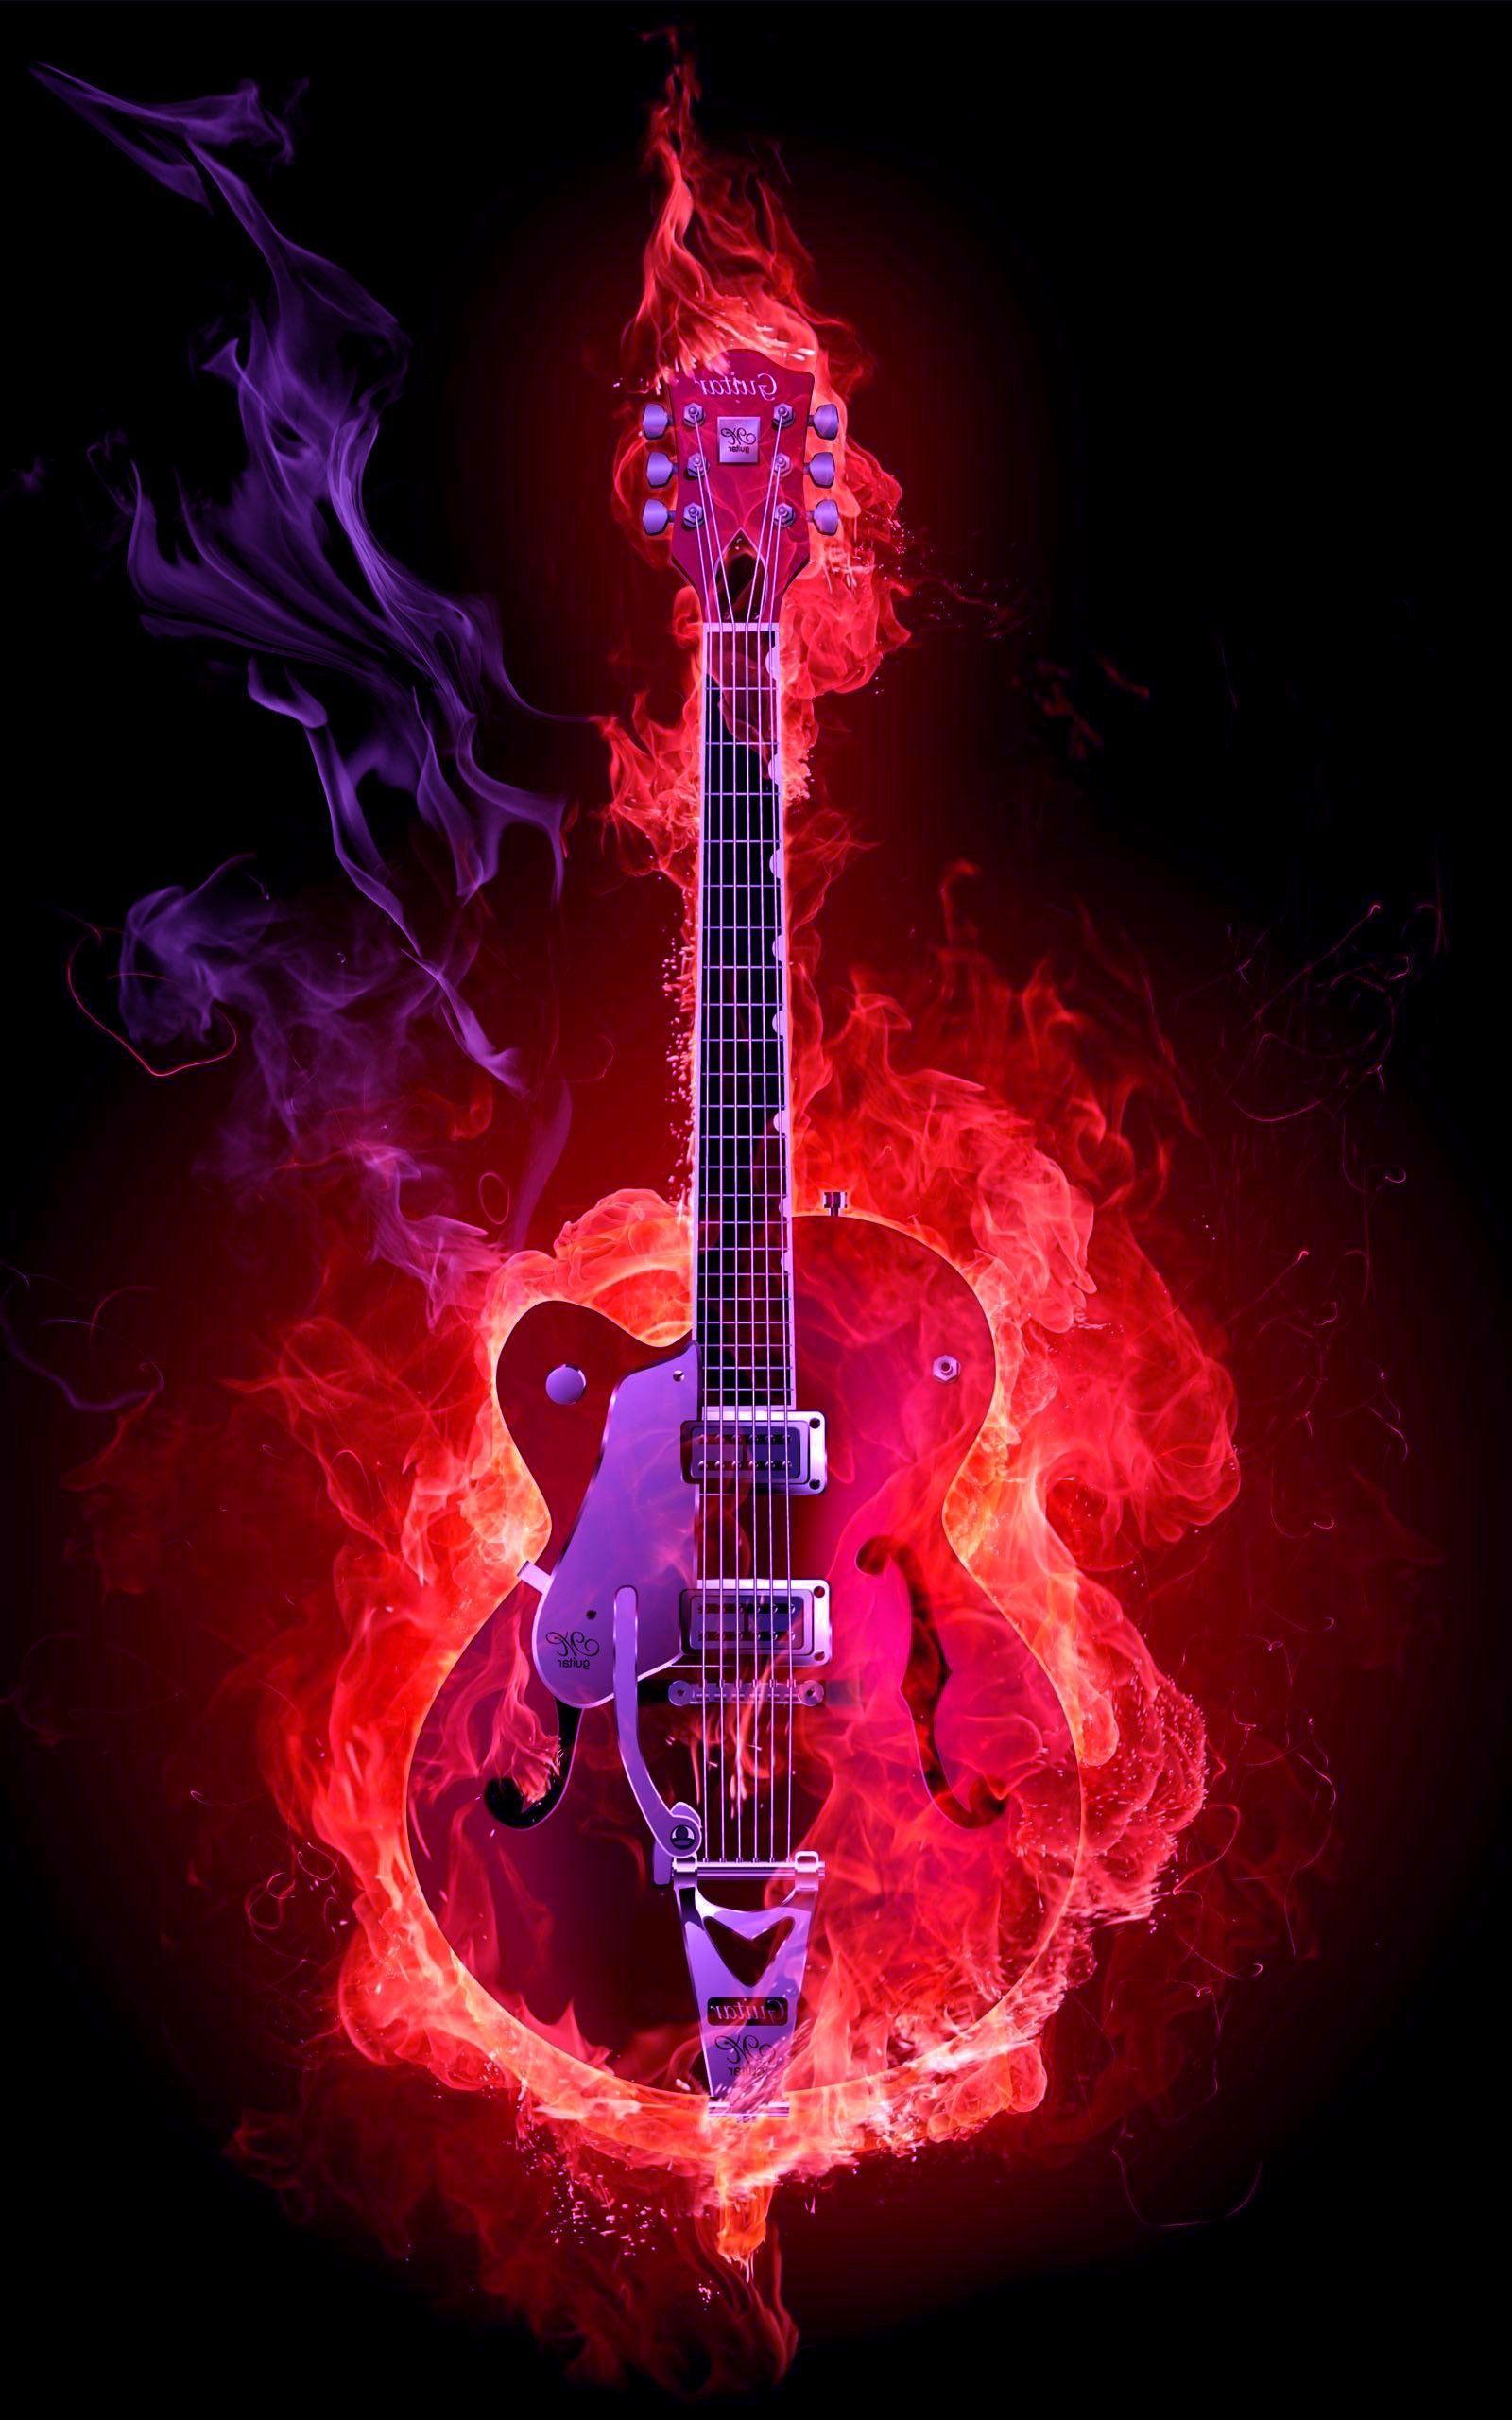 Flame Guitar Hd Wallpaper 1600 2560 High Definition Wallpaper Daily Screens Id 3331 593841900844701483 Guitar Wallpaper Iphone Music Wallpaper Hd Wallpaper